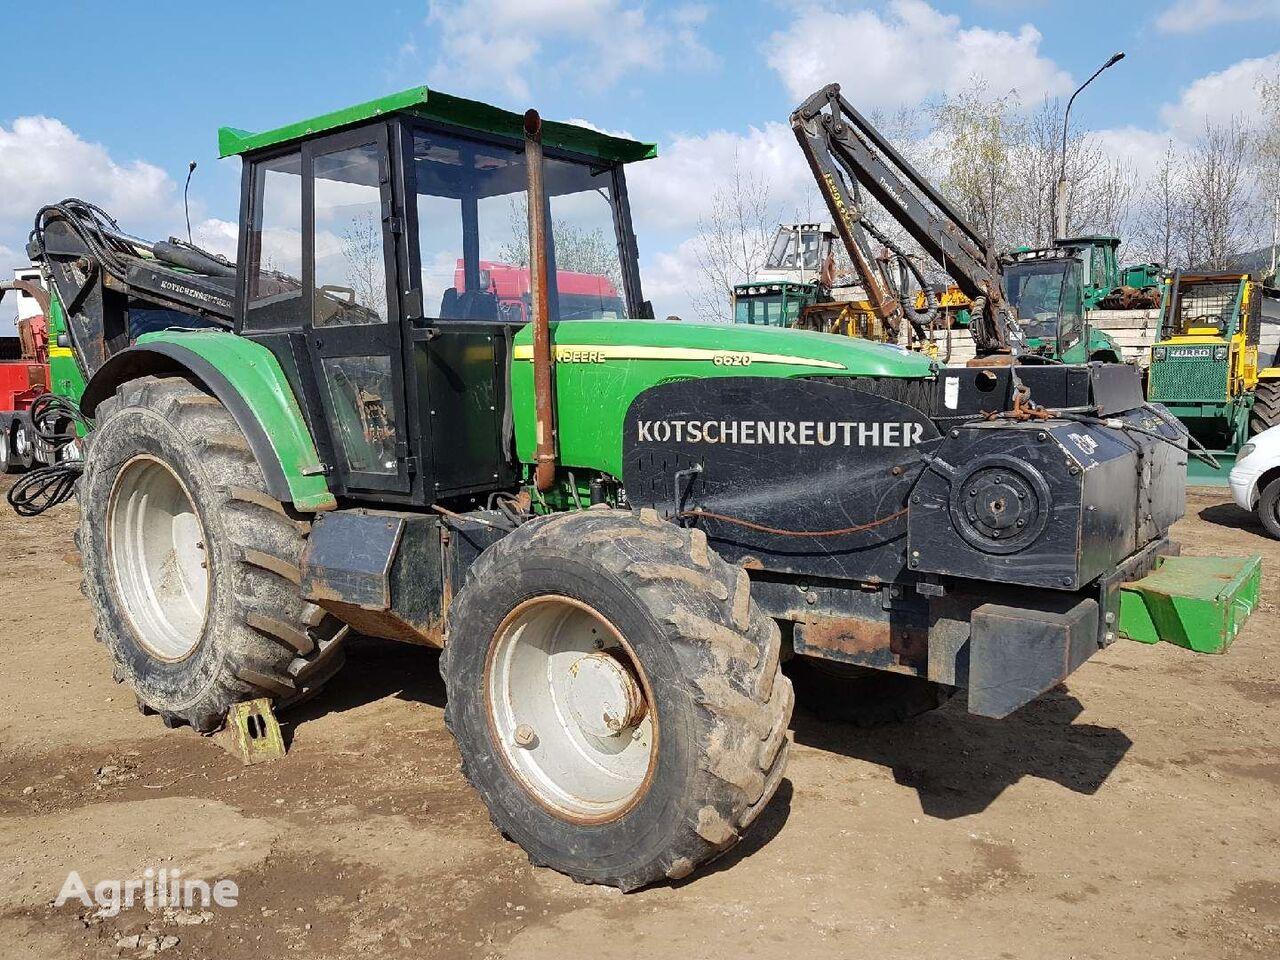 lesný traktor JOHN DEERE 6620 KOTSCHENREUTHER